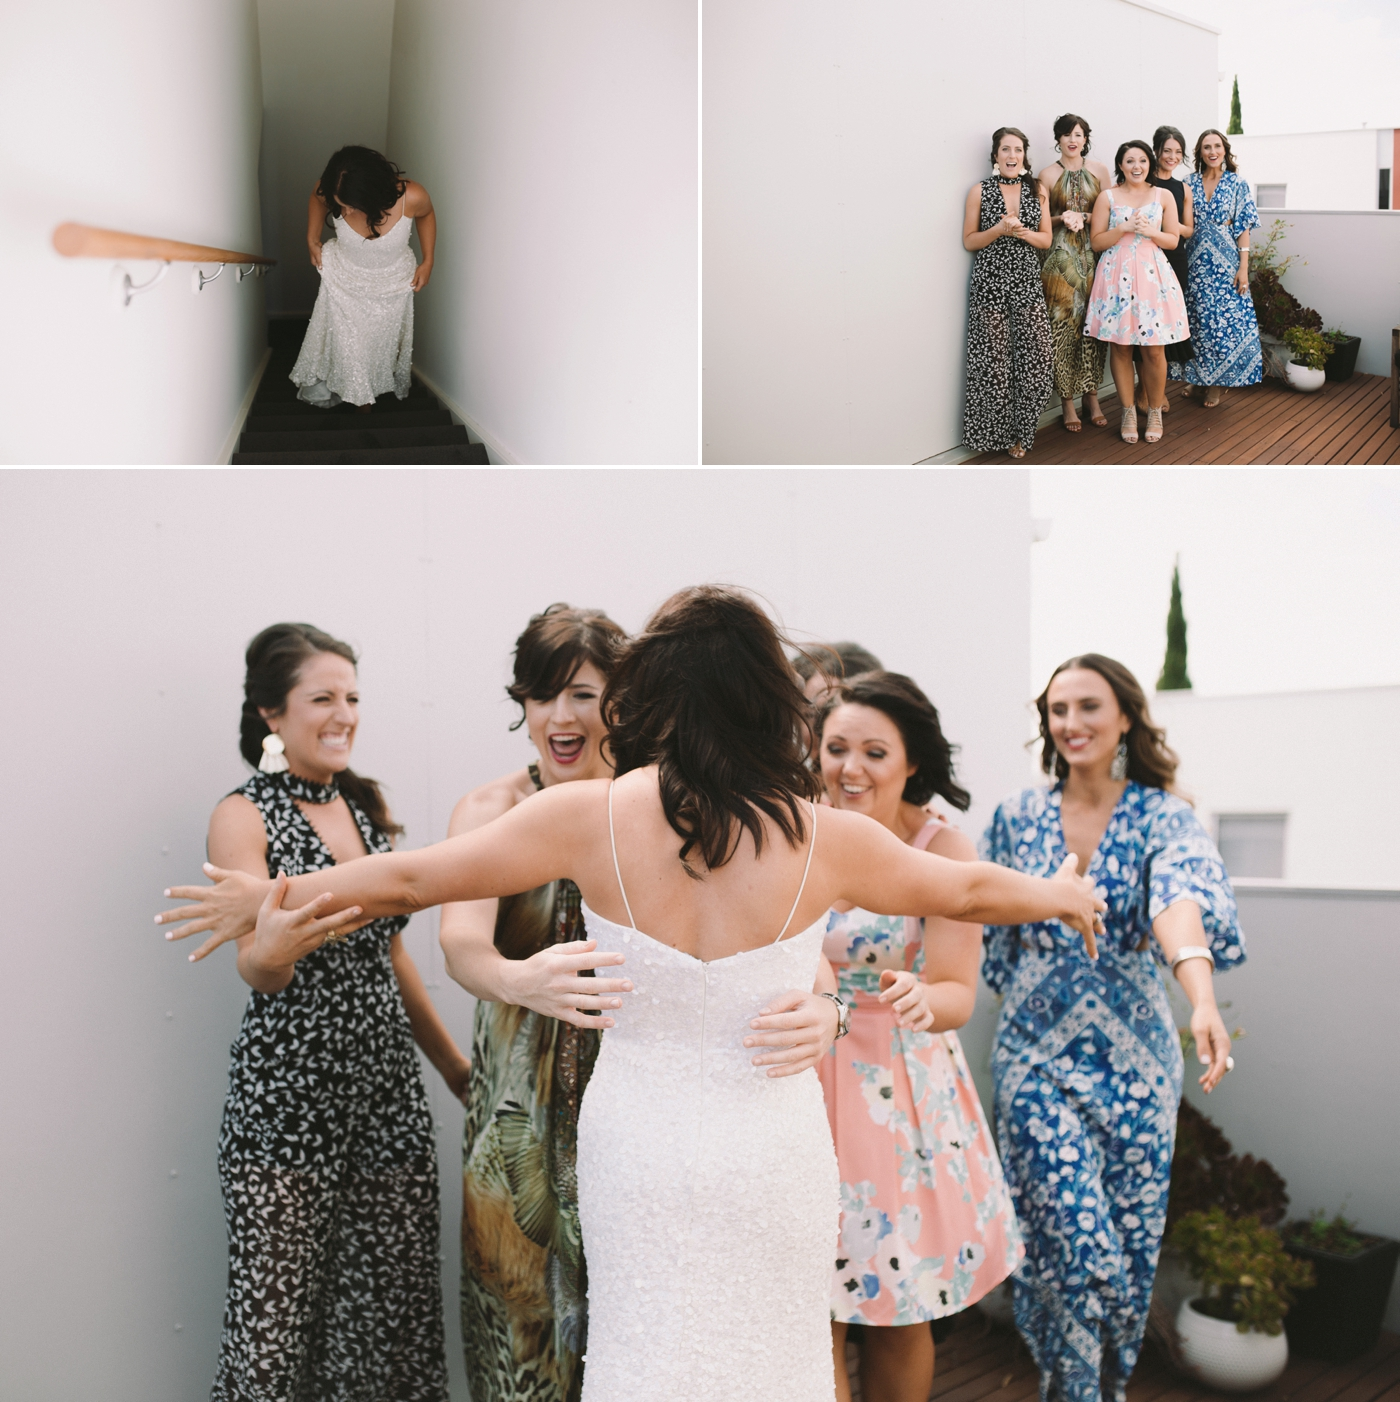 Kellie & Brent - Adelaide City Wedding - Natural wedding photography in Adelaide - Katherine Schultz - www.katherineschultzphotography.com 11